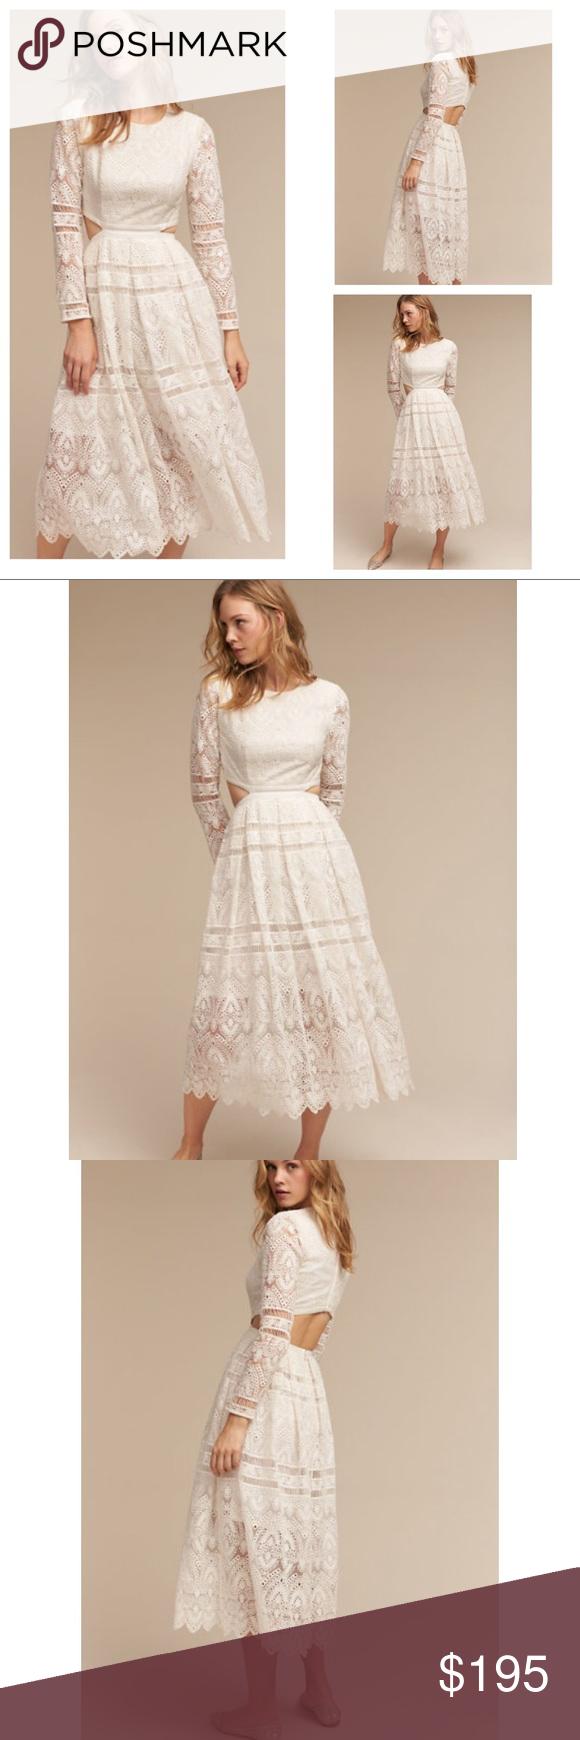 a1be8b90eee NWT BHLDN Anthro Thurley Fallon Dress Au 12/US 6-8 NWT, This is an ...